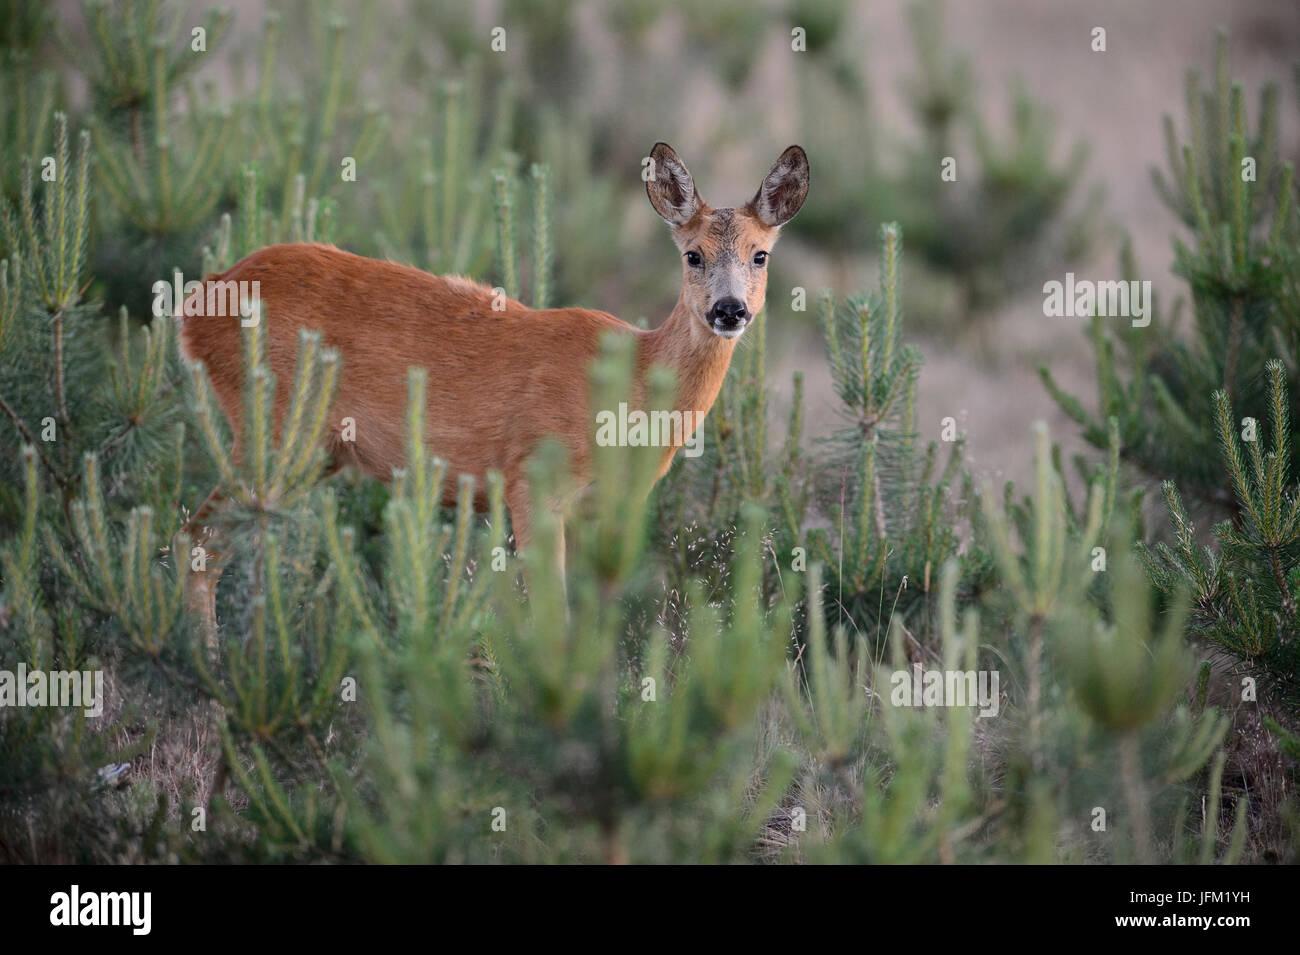 Chevreuil femelle entre youne pins. Le Parc national Hoge Veluwe, Pays-Bas Photo Stock